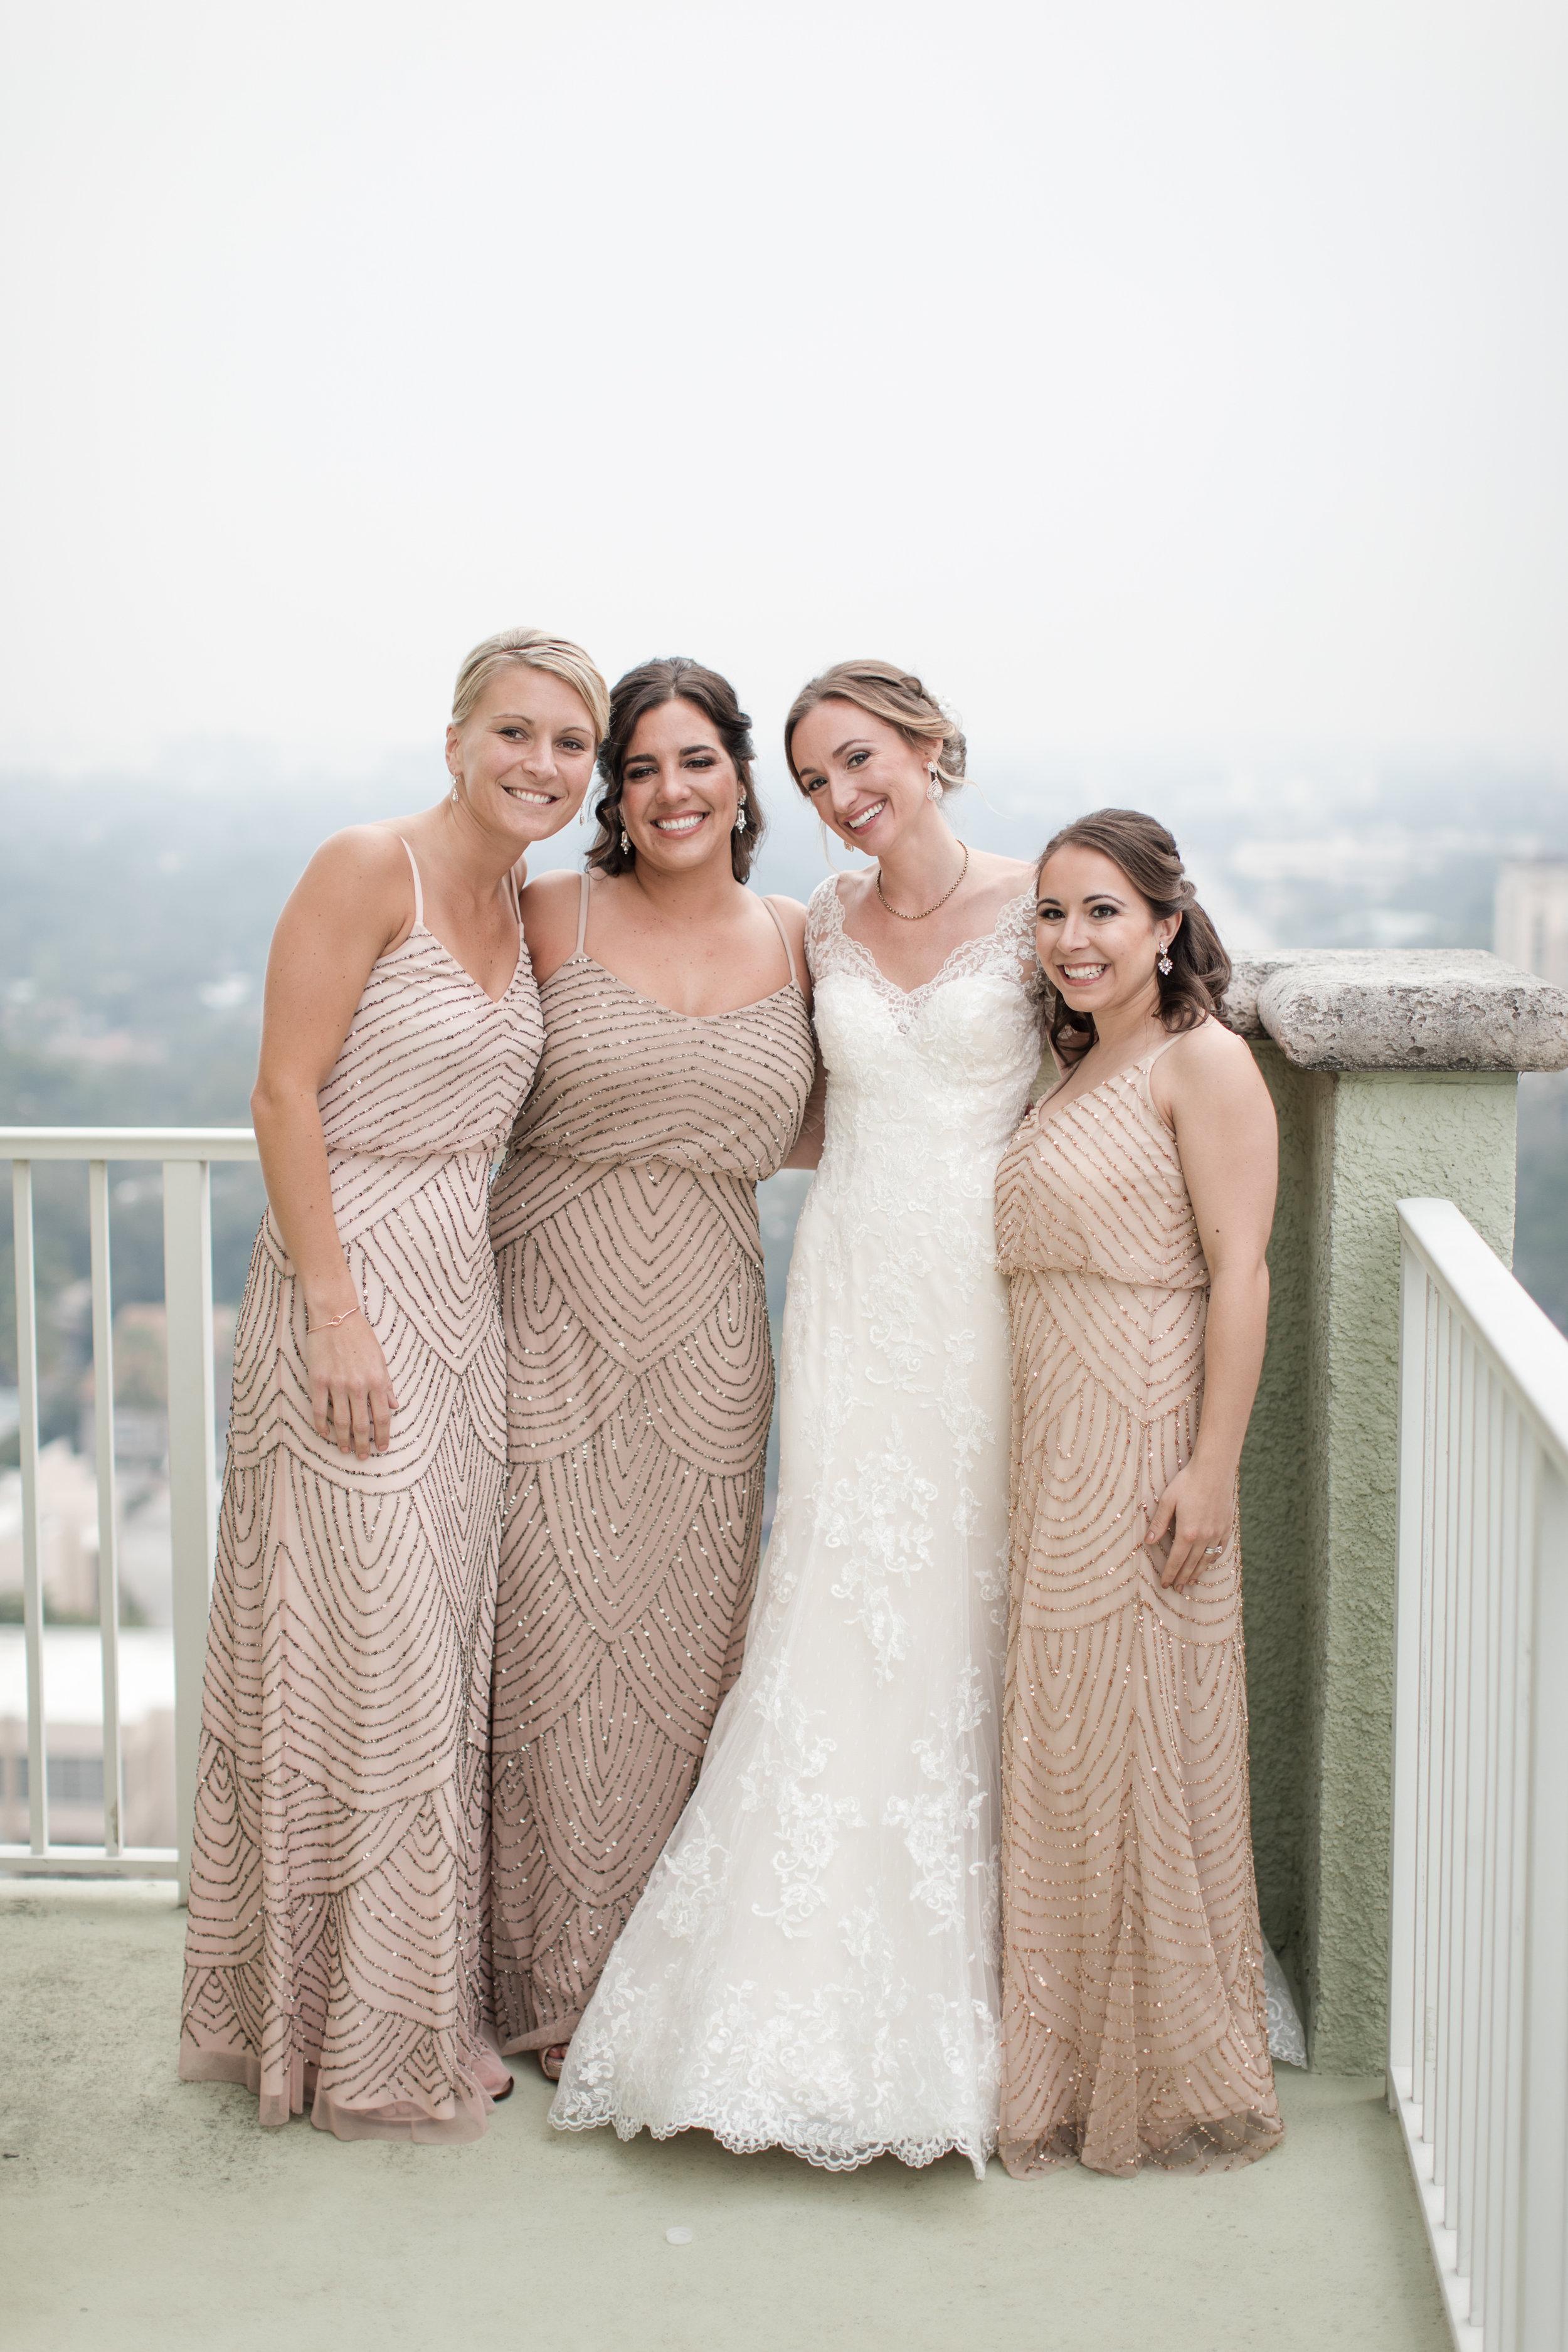 South-Florida-wedding-photographer-fort-lauderdale-venue-fog-bridesmaids